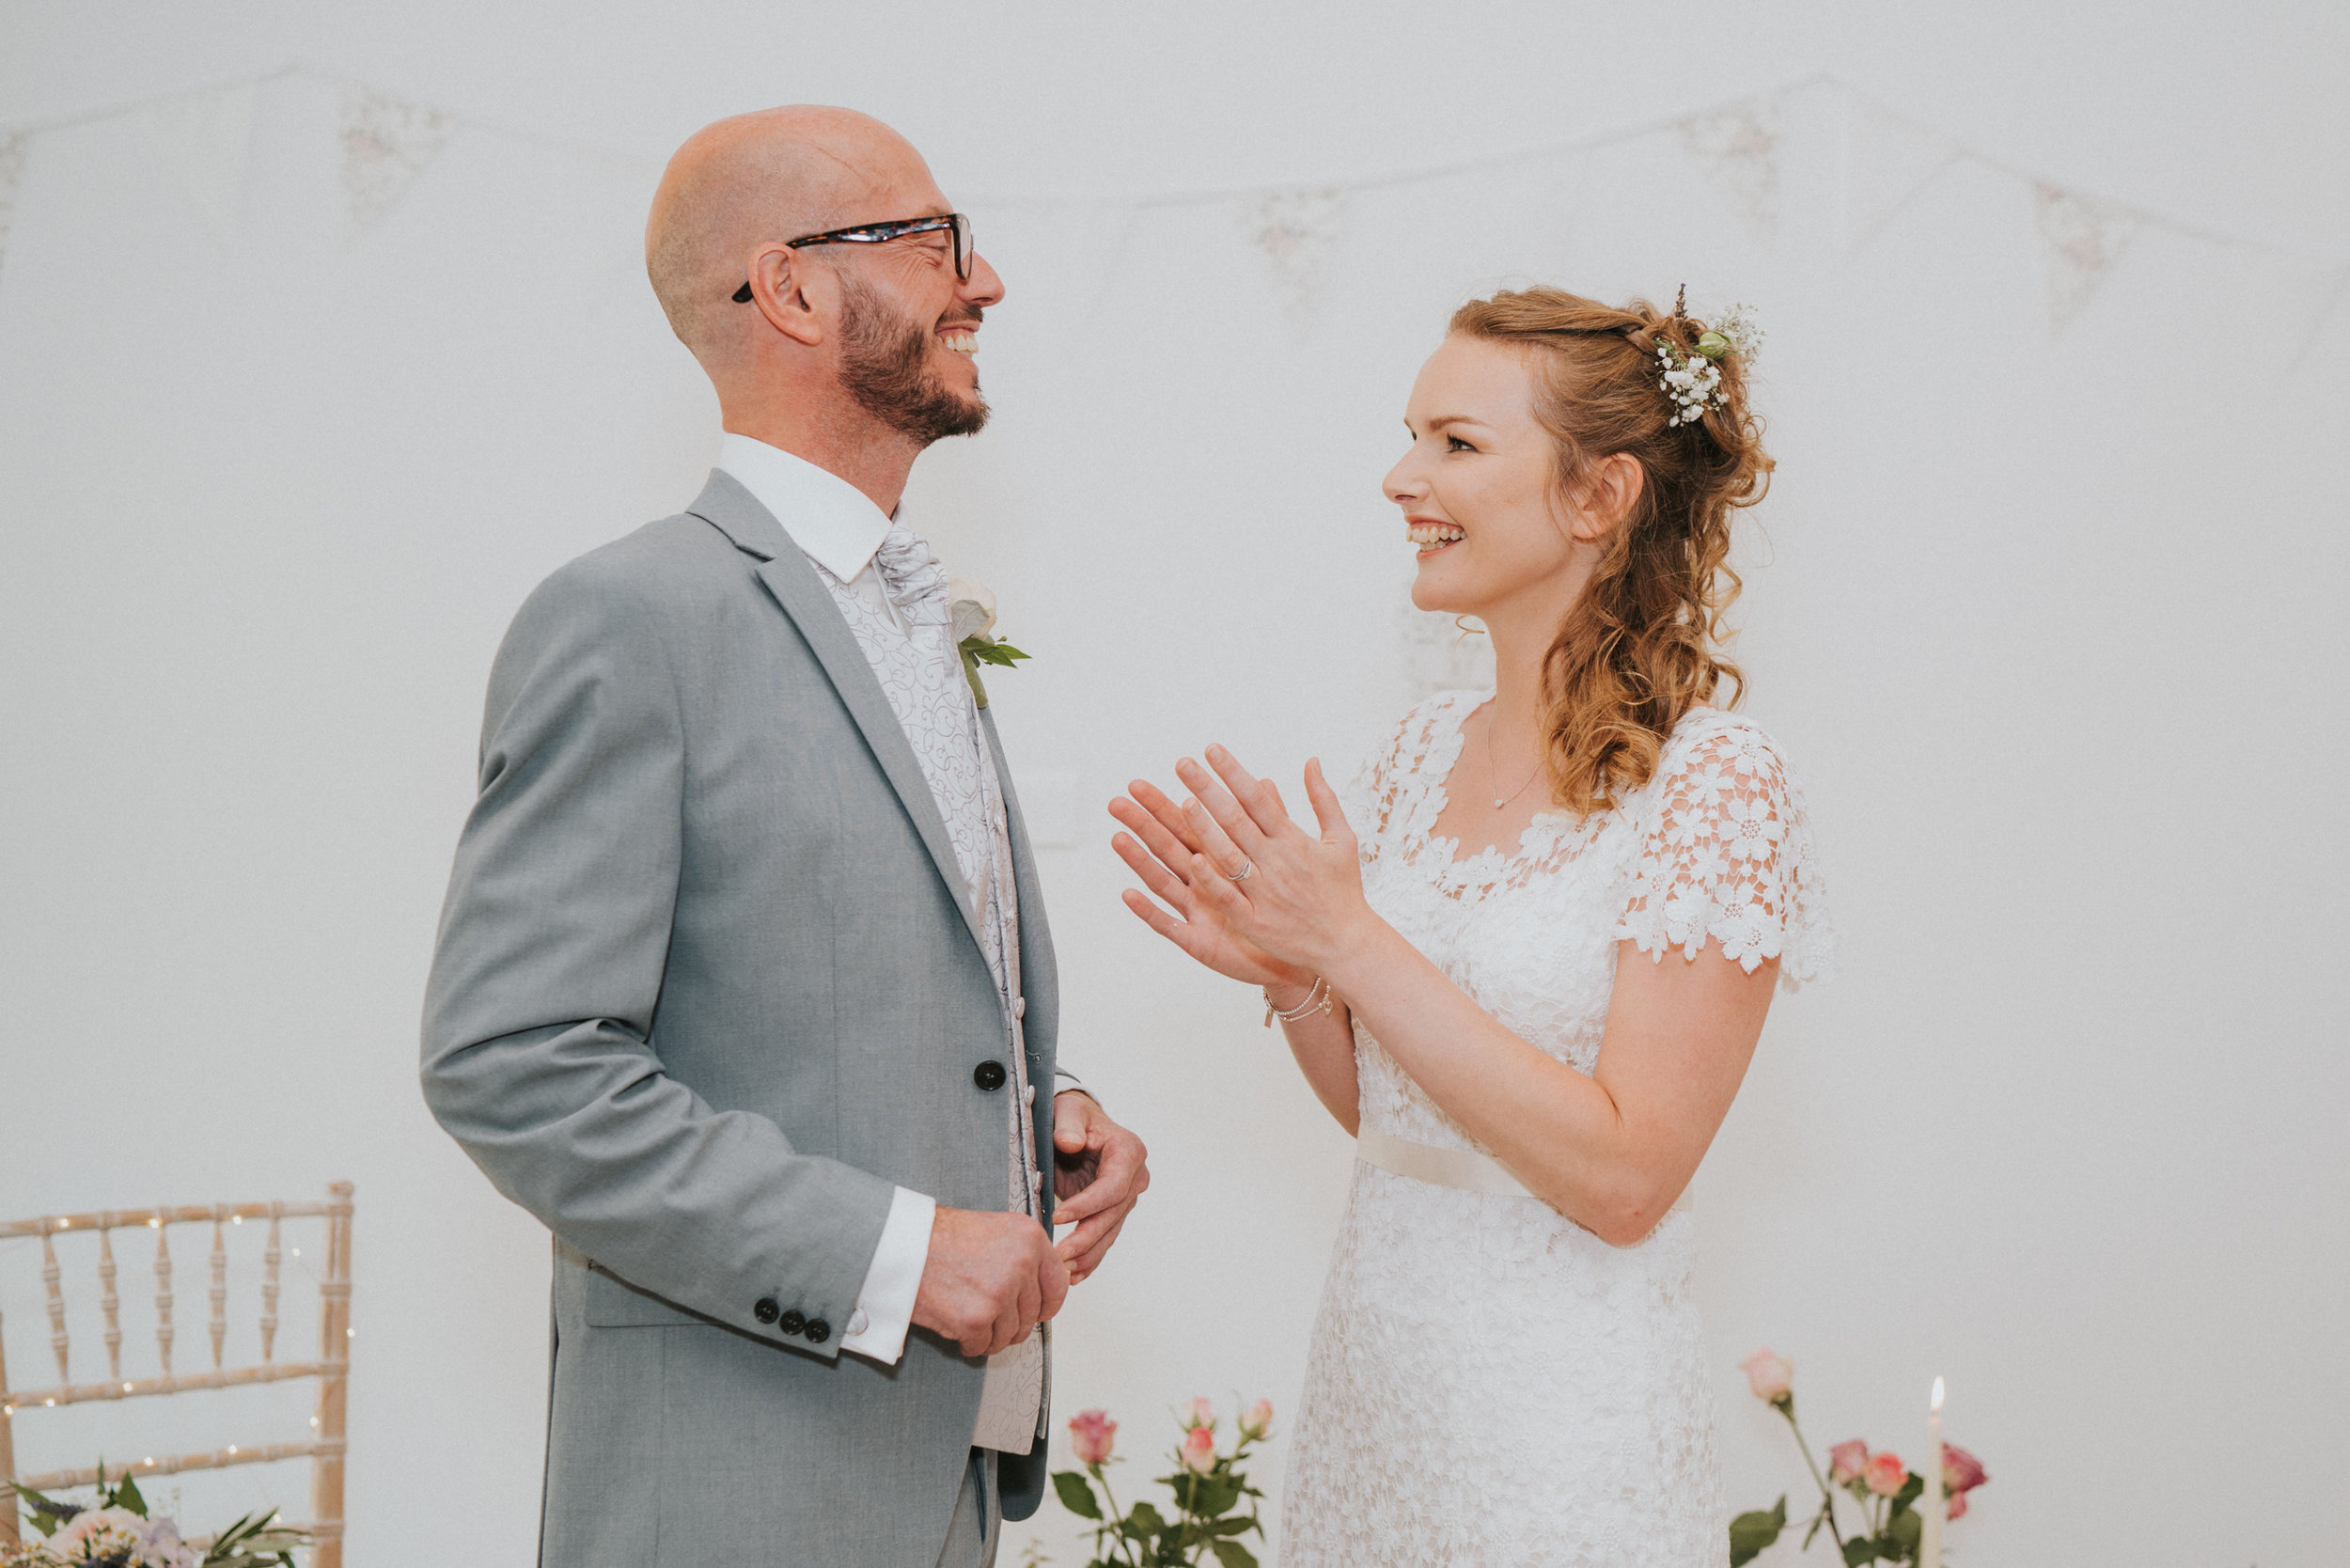 Grace-Elizabeth-Georgie-Amalaketu-Firstsite-Colchester-Essex-Boho-Buddhist-Wedding-Alternative-Wedding-Photography-Essex (60 of 100).jpg